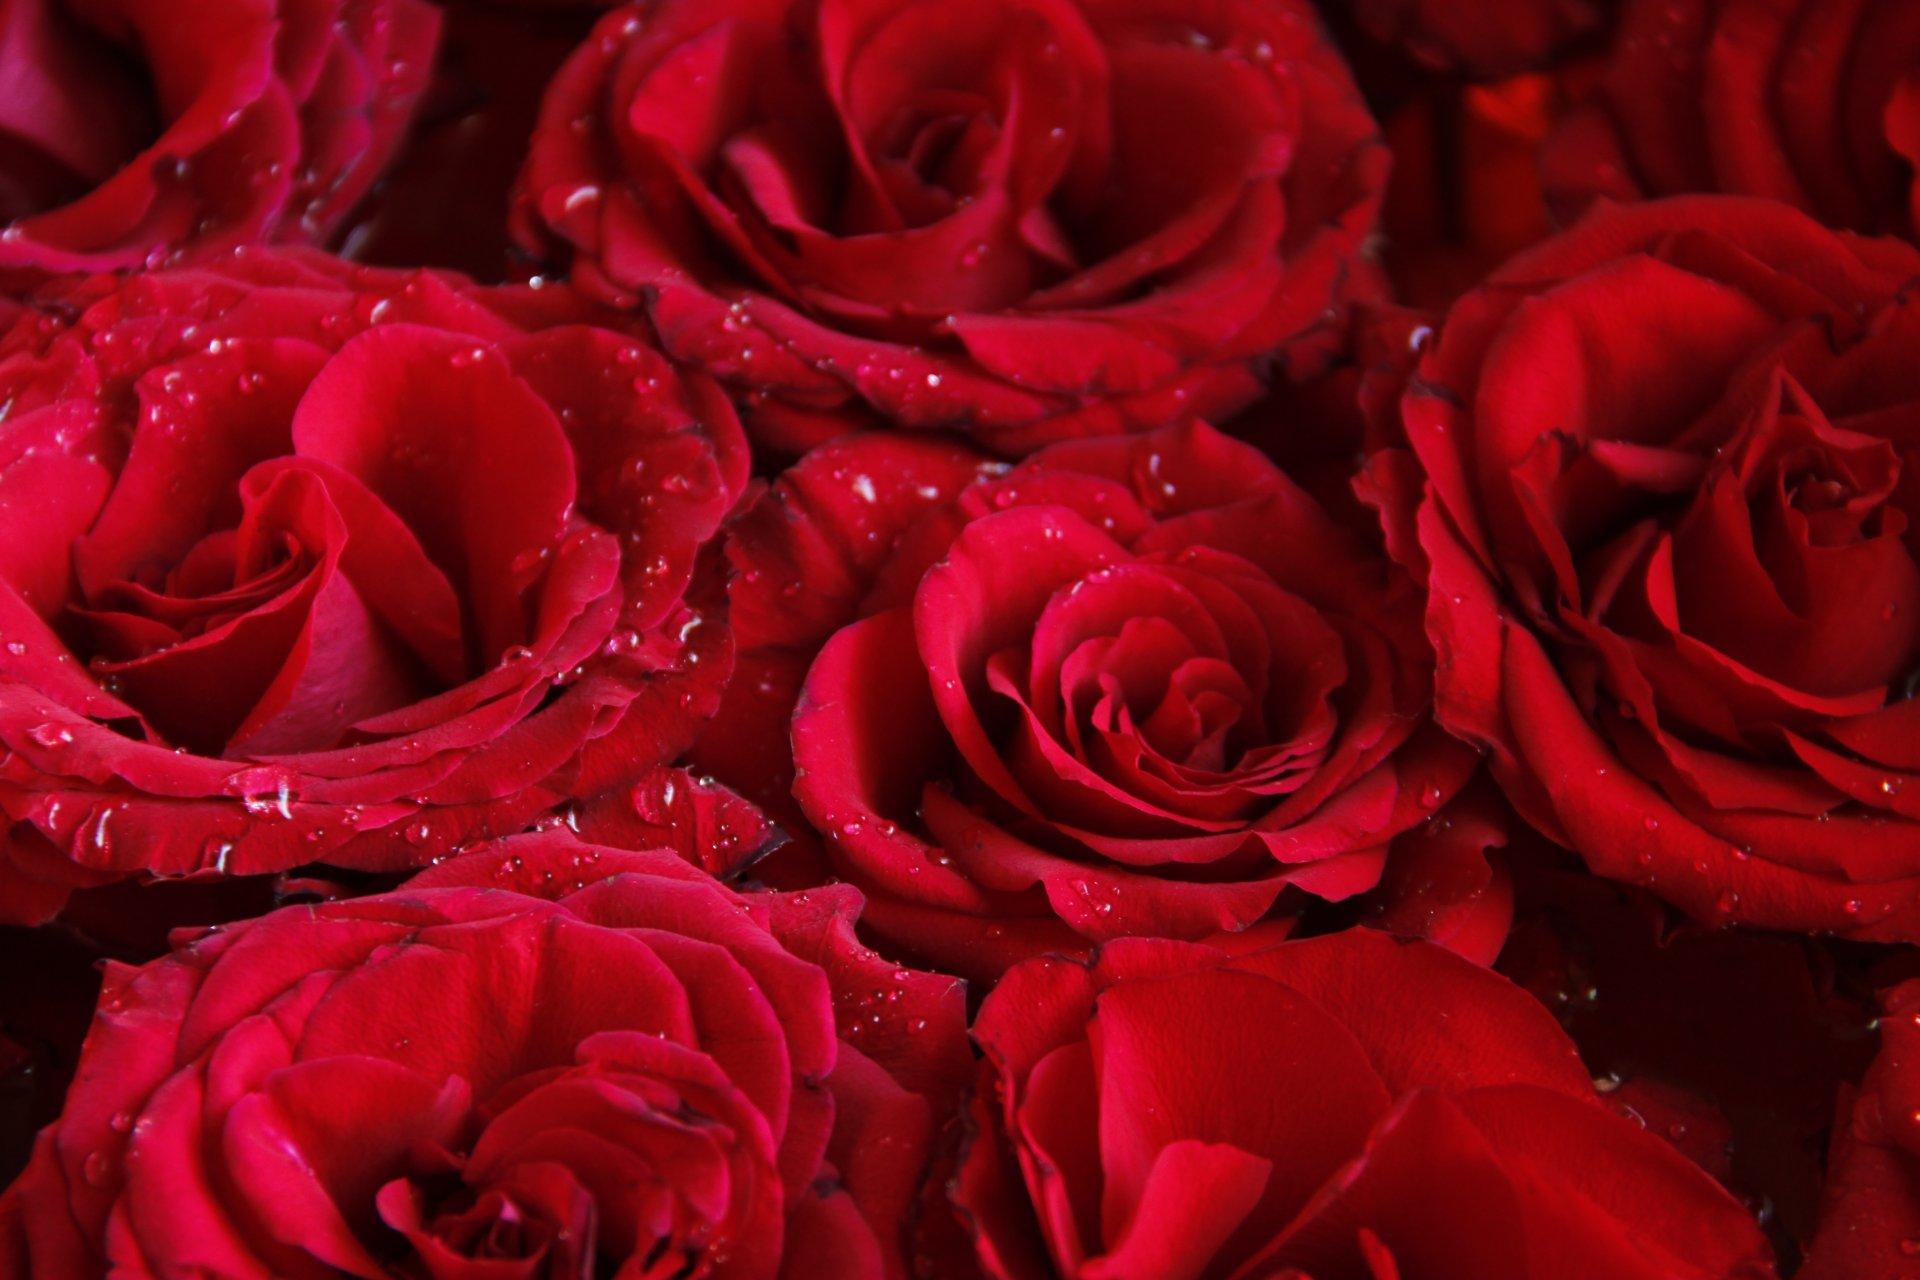 форма фото ярких красных роз того